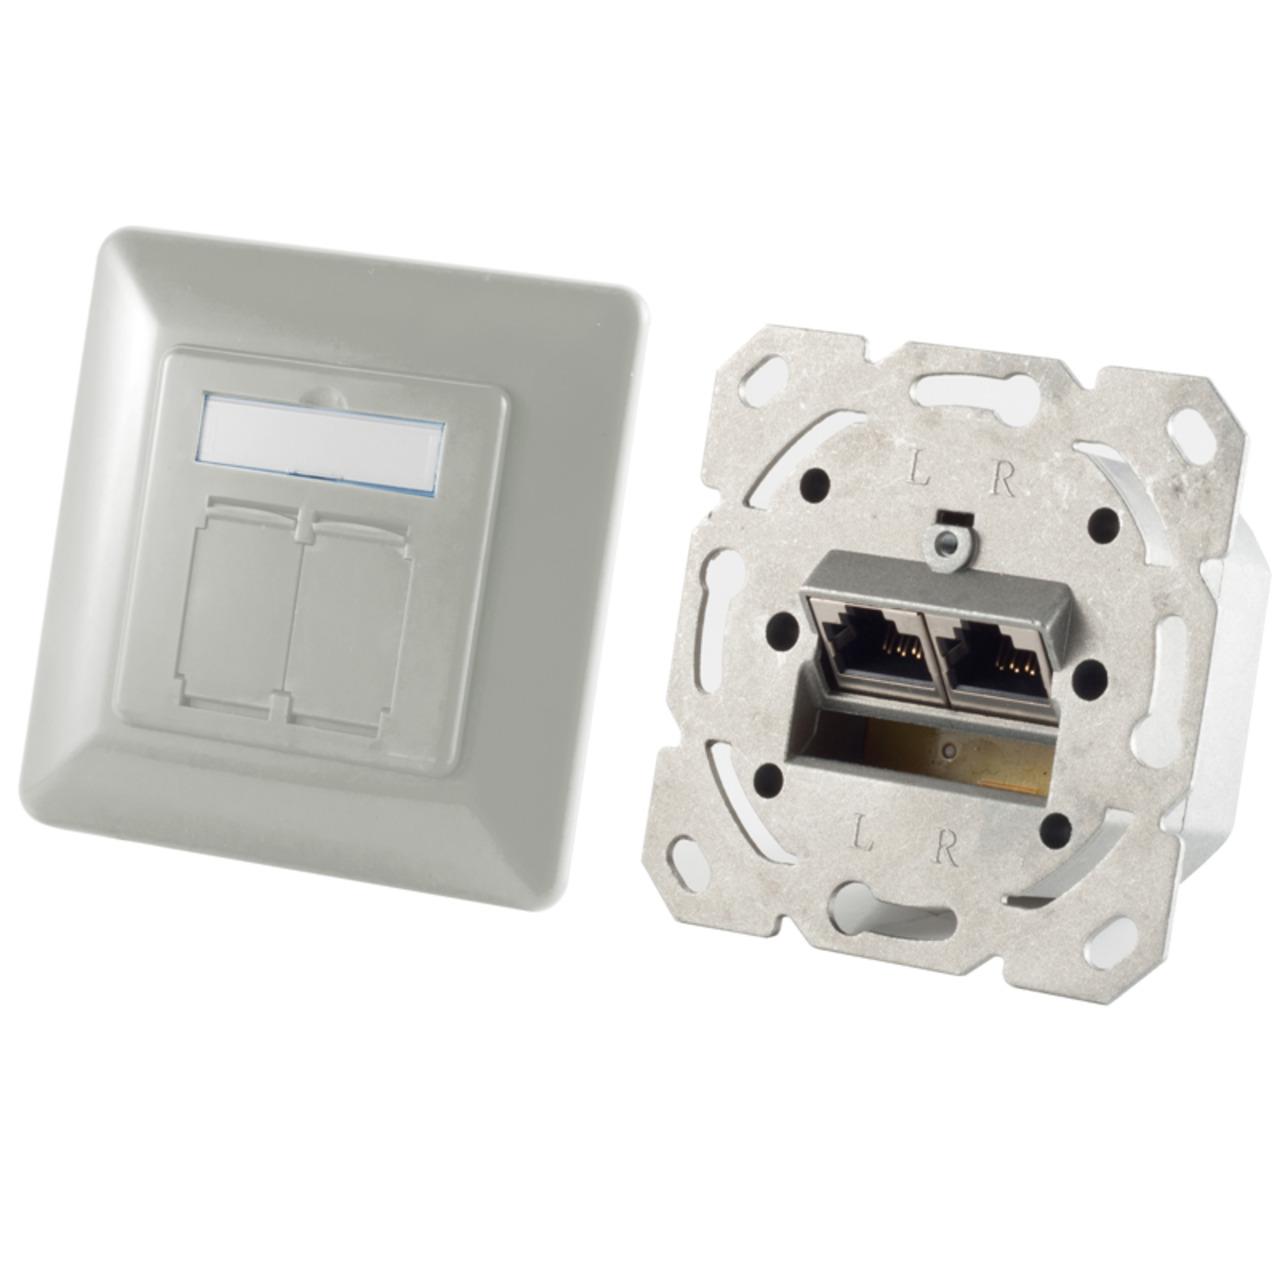 Shiverpeaks Netzwerkdose BASIC-S- Cat- 6A- 2x RJ45-Buchse- silber-grau